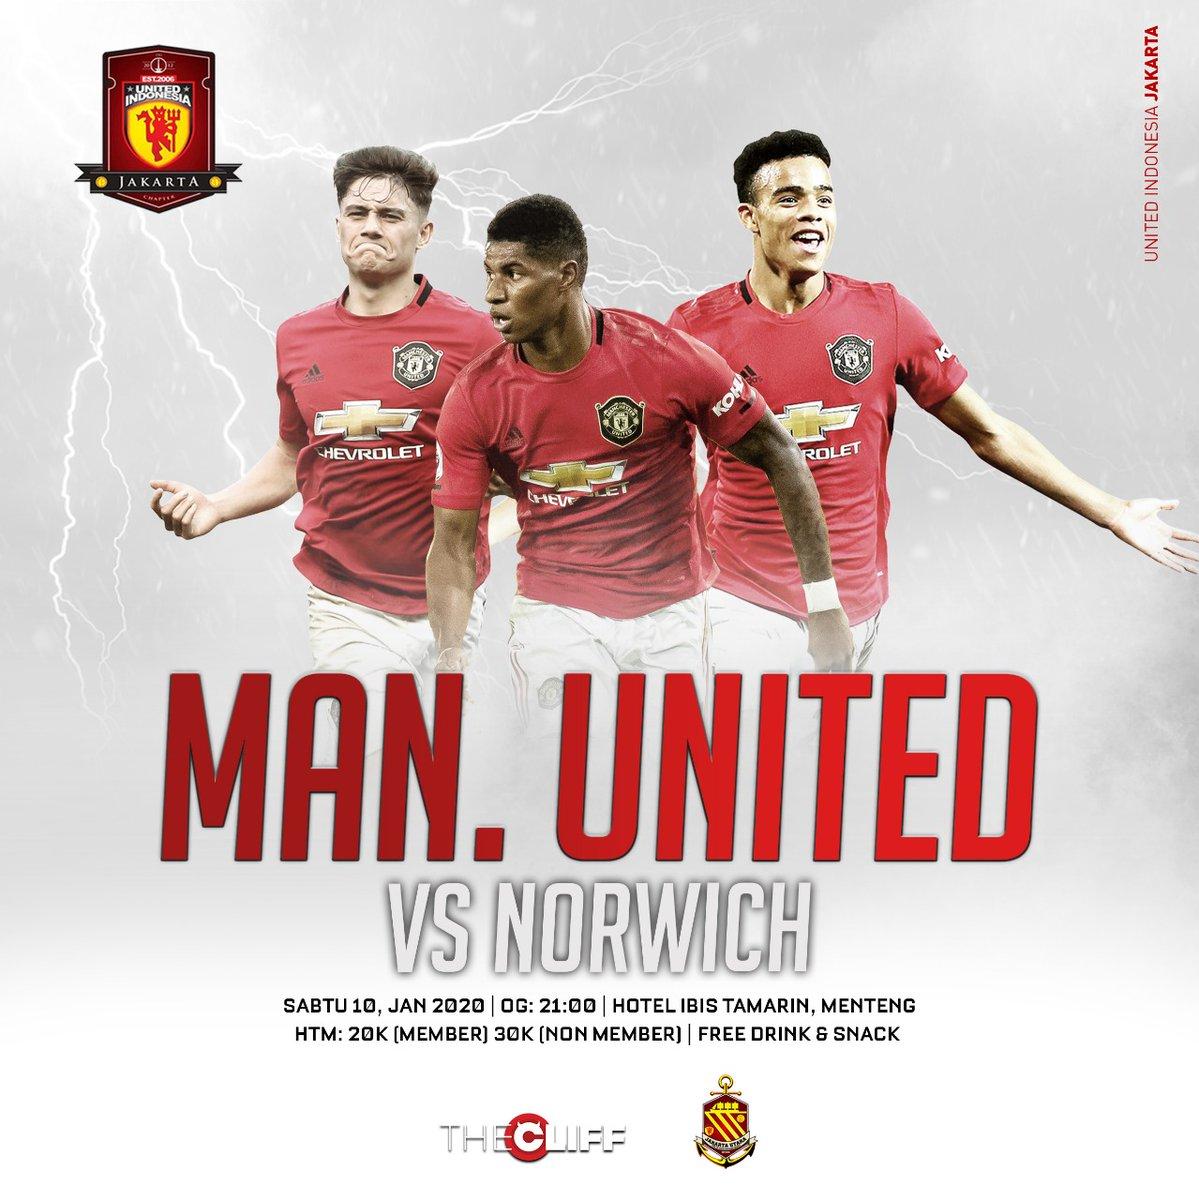 #LiveScreening Manchester United vs Norwich City, At Hotel Ibis Tamarin, Kh. Wahid Hasyim Menteng. Open gate 21.00 Fdc? 20-30 untuk member dan non member, see you there!   #UiJKT https://t.co/7ixTdNo1VR